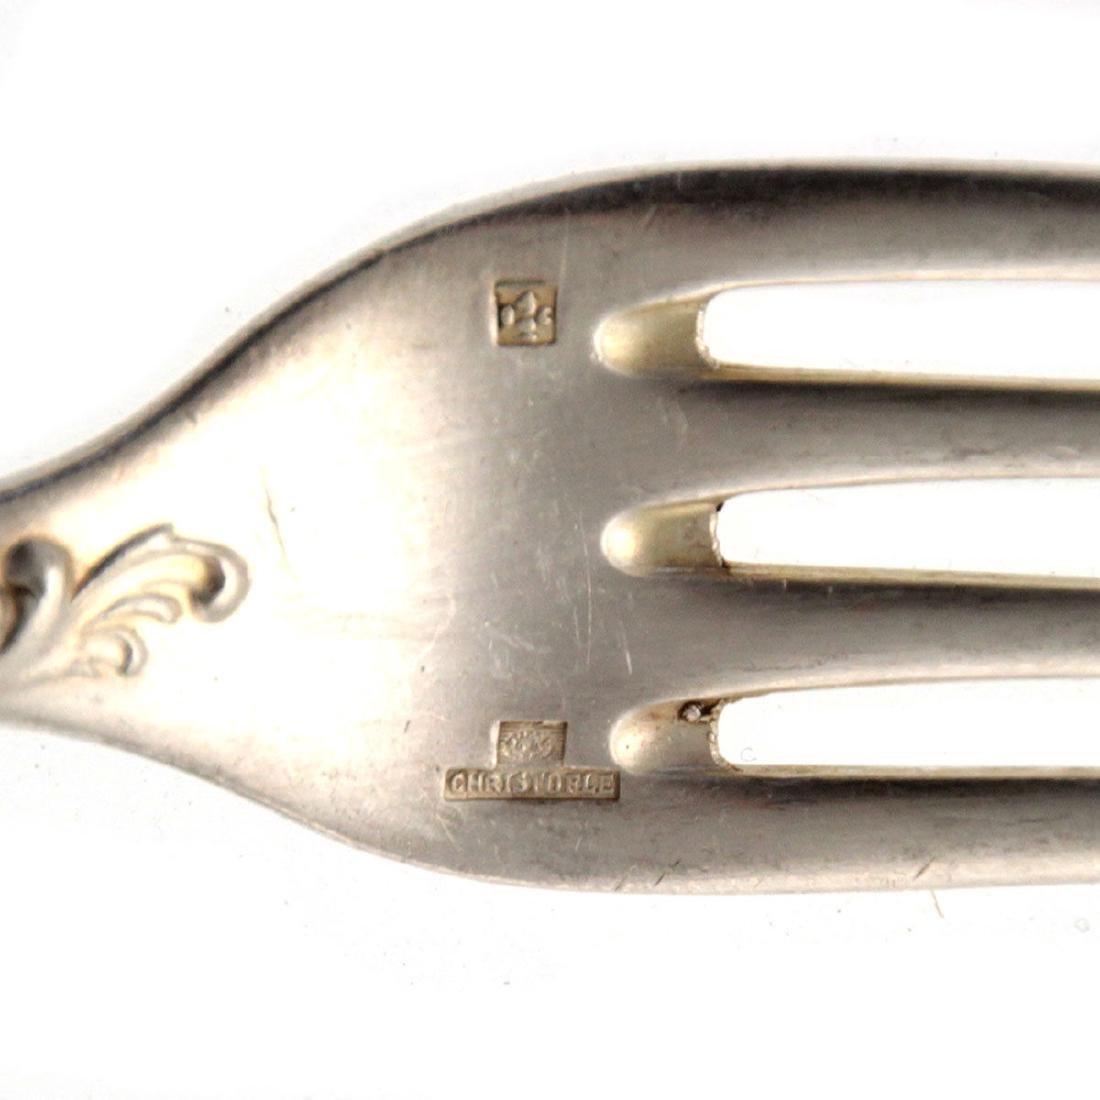 Christofle 65pcs Silver Plated Flatware Cutlery Set, - 8